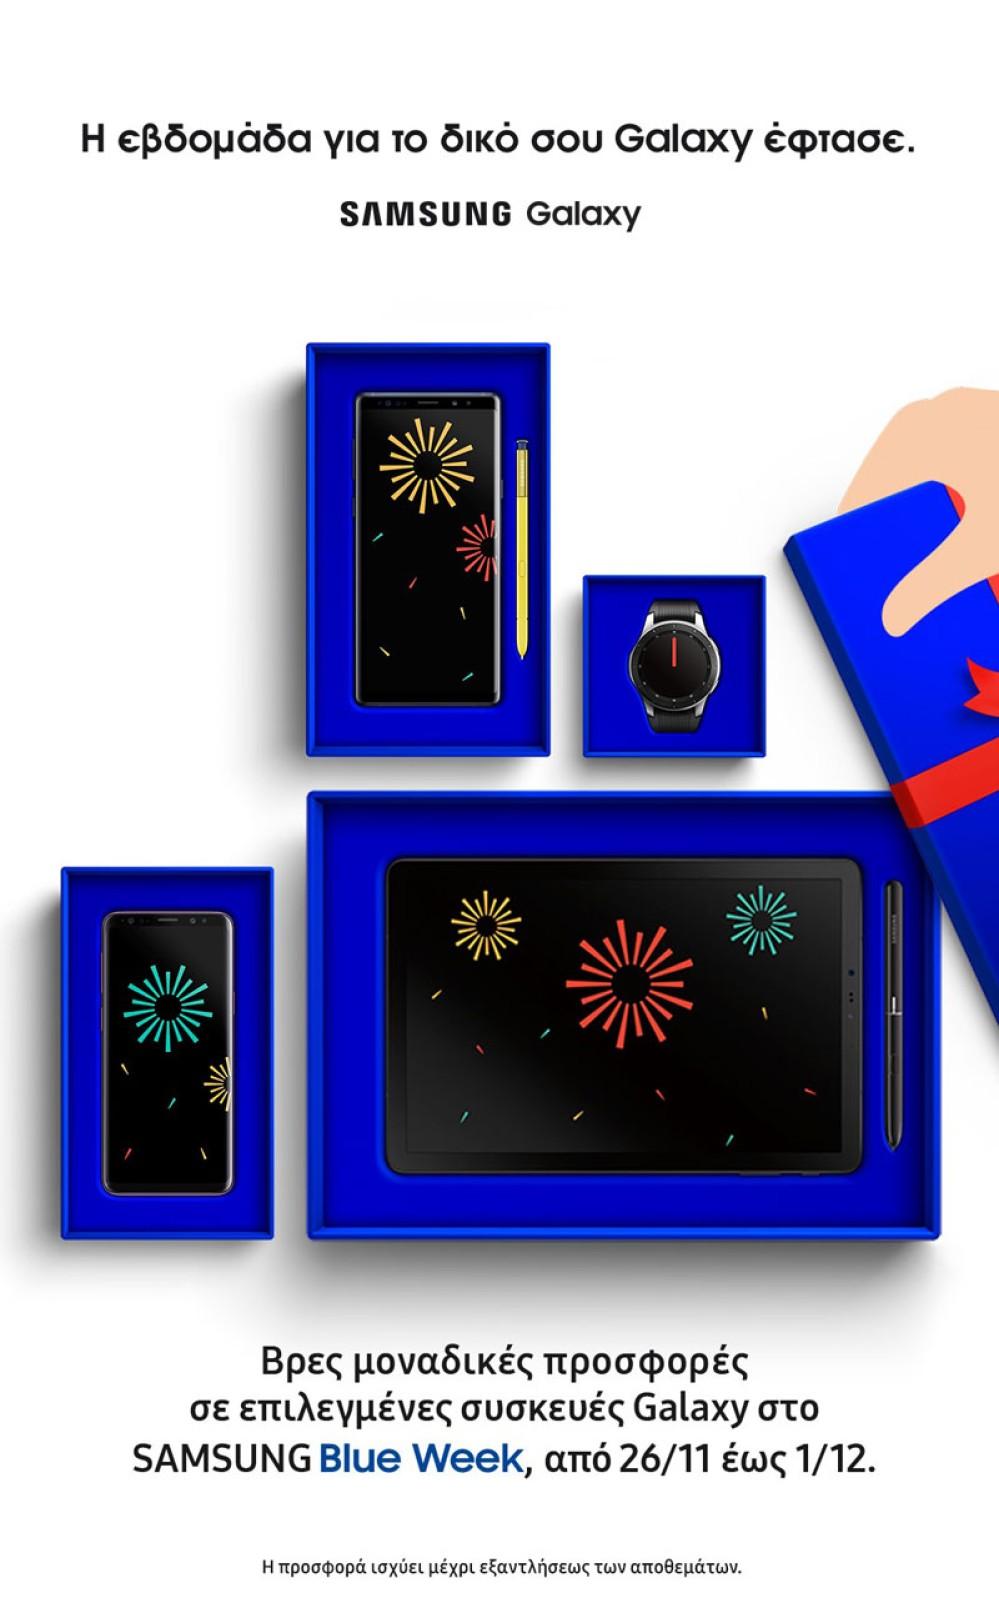 Samsung Blue Week: Μοναδικές προσφορές σε επιλεγμένες Galaxy συσκευές μέχρι 1η Δεκεμβρίου